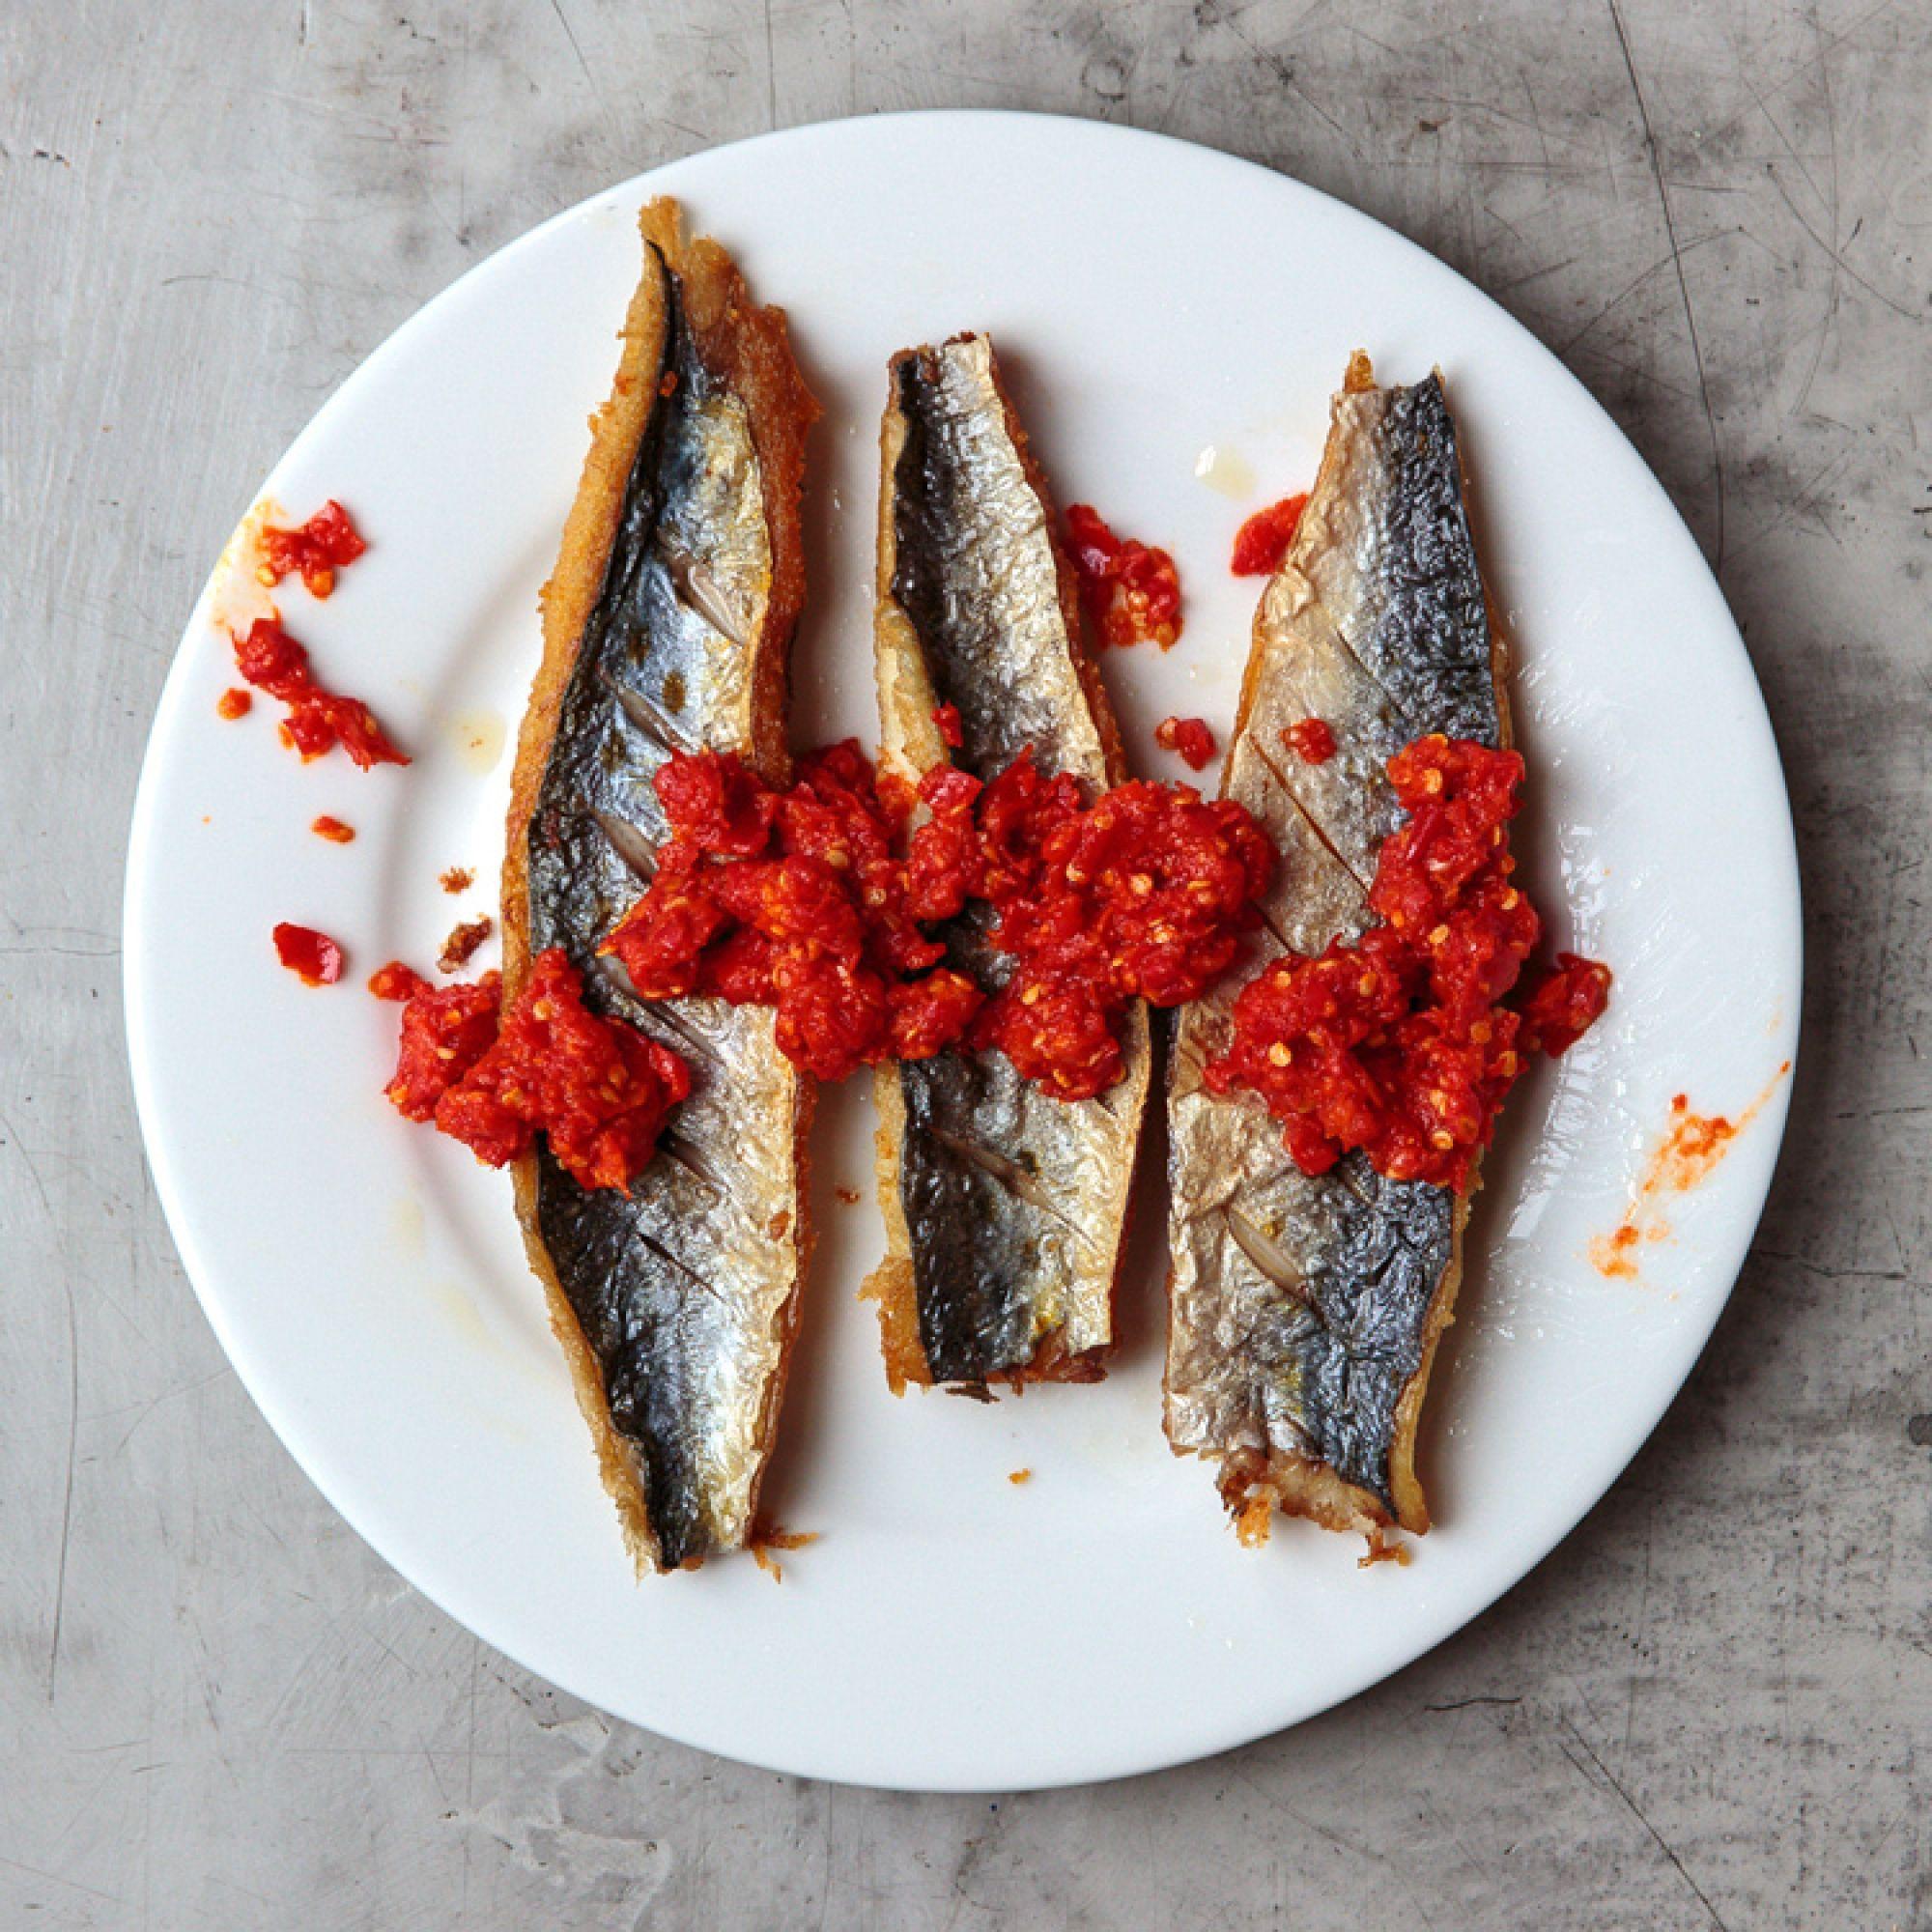 Ikan Balado Padang Style Grilled Mackerel With Sambal Grilled Fish Recipes Grilled Mackerel Sambal Recipe